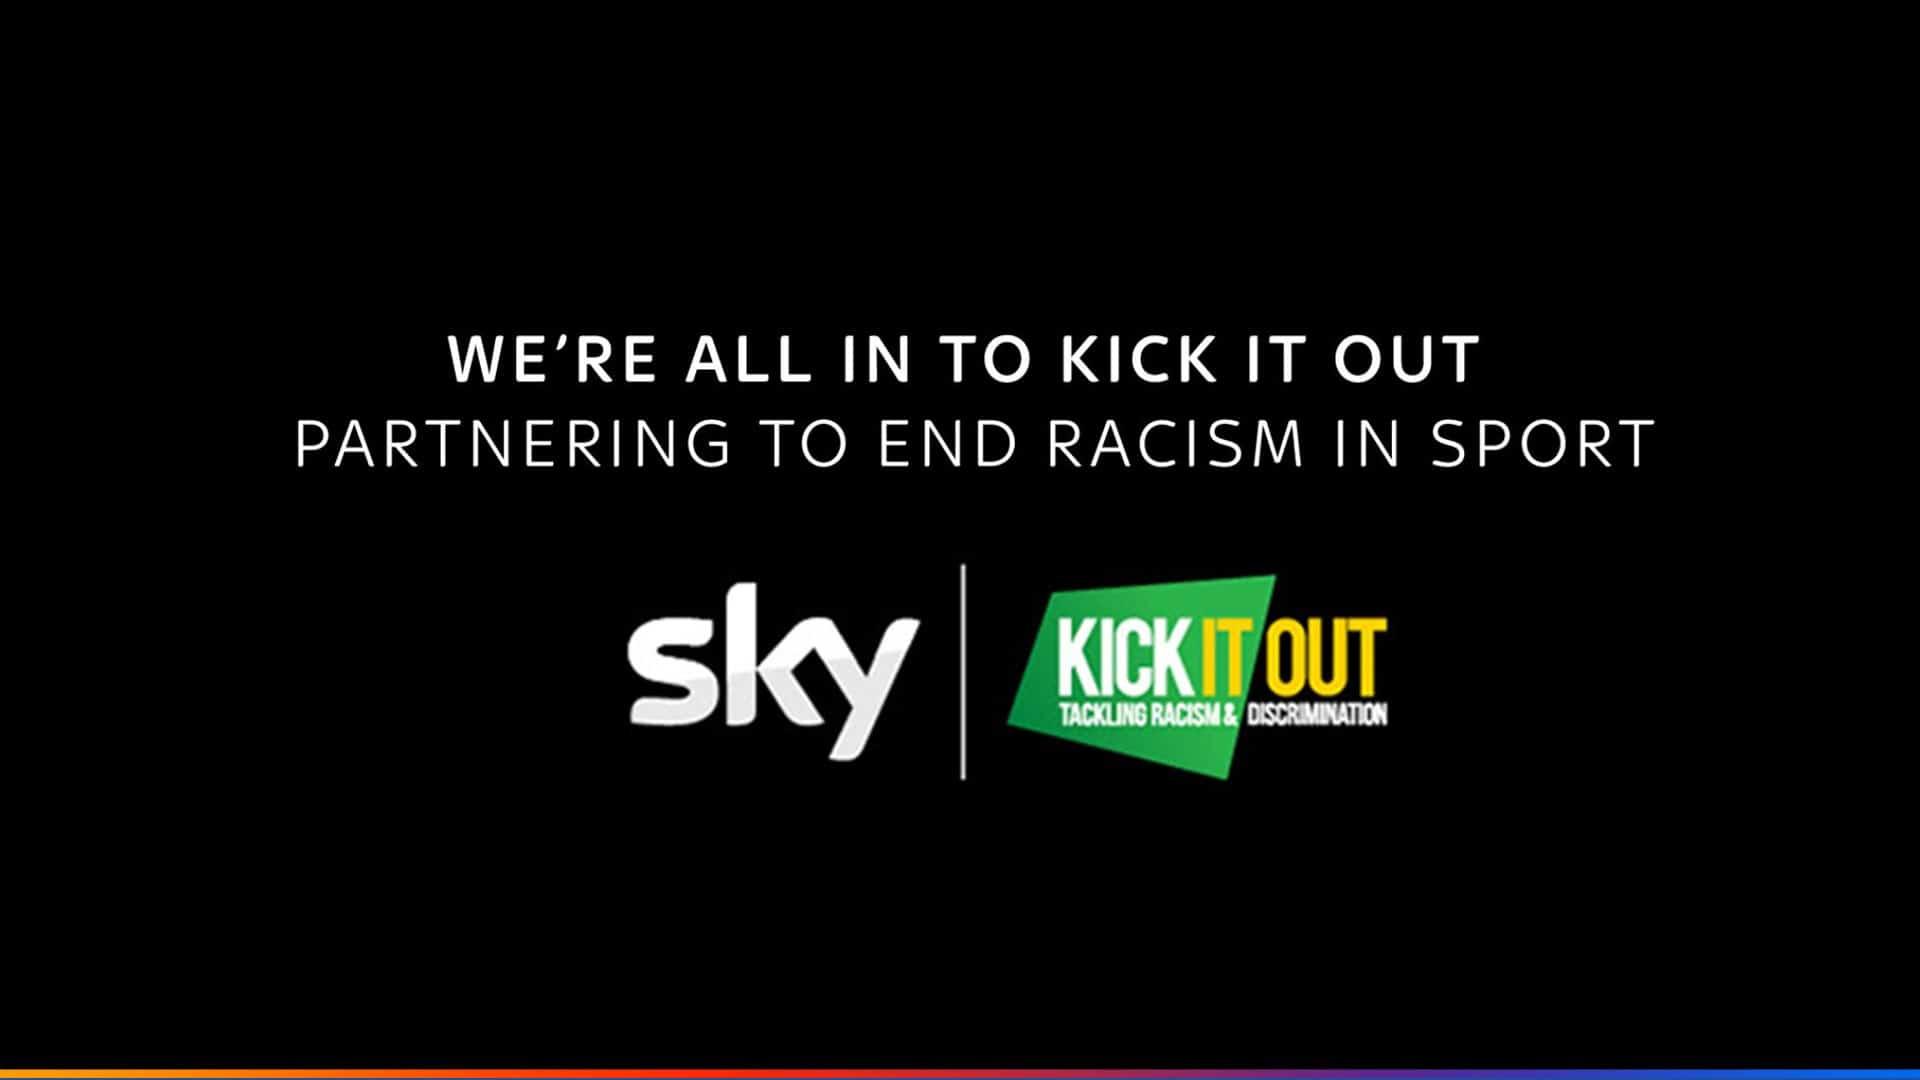 sky kick it out partnership